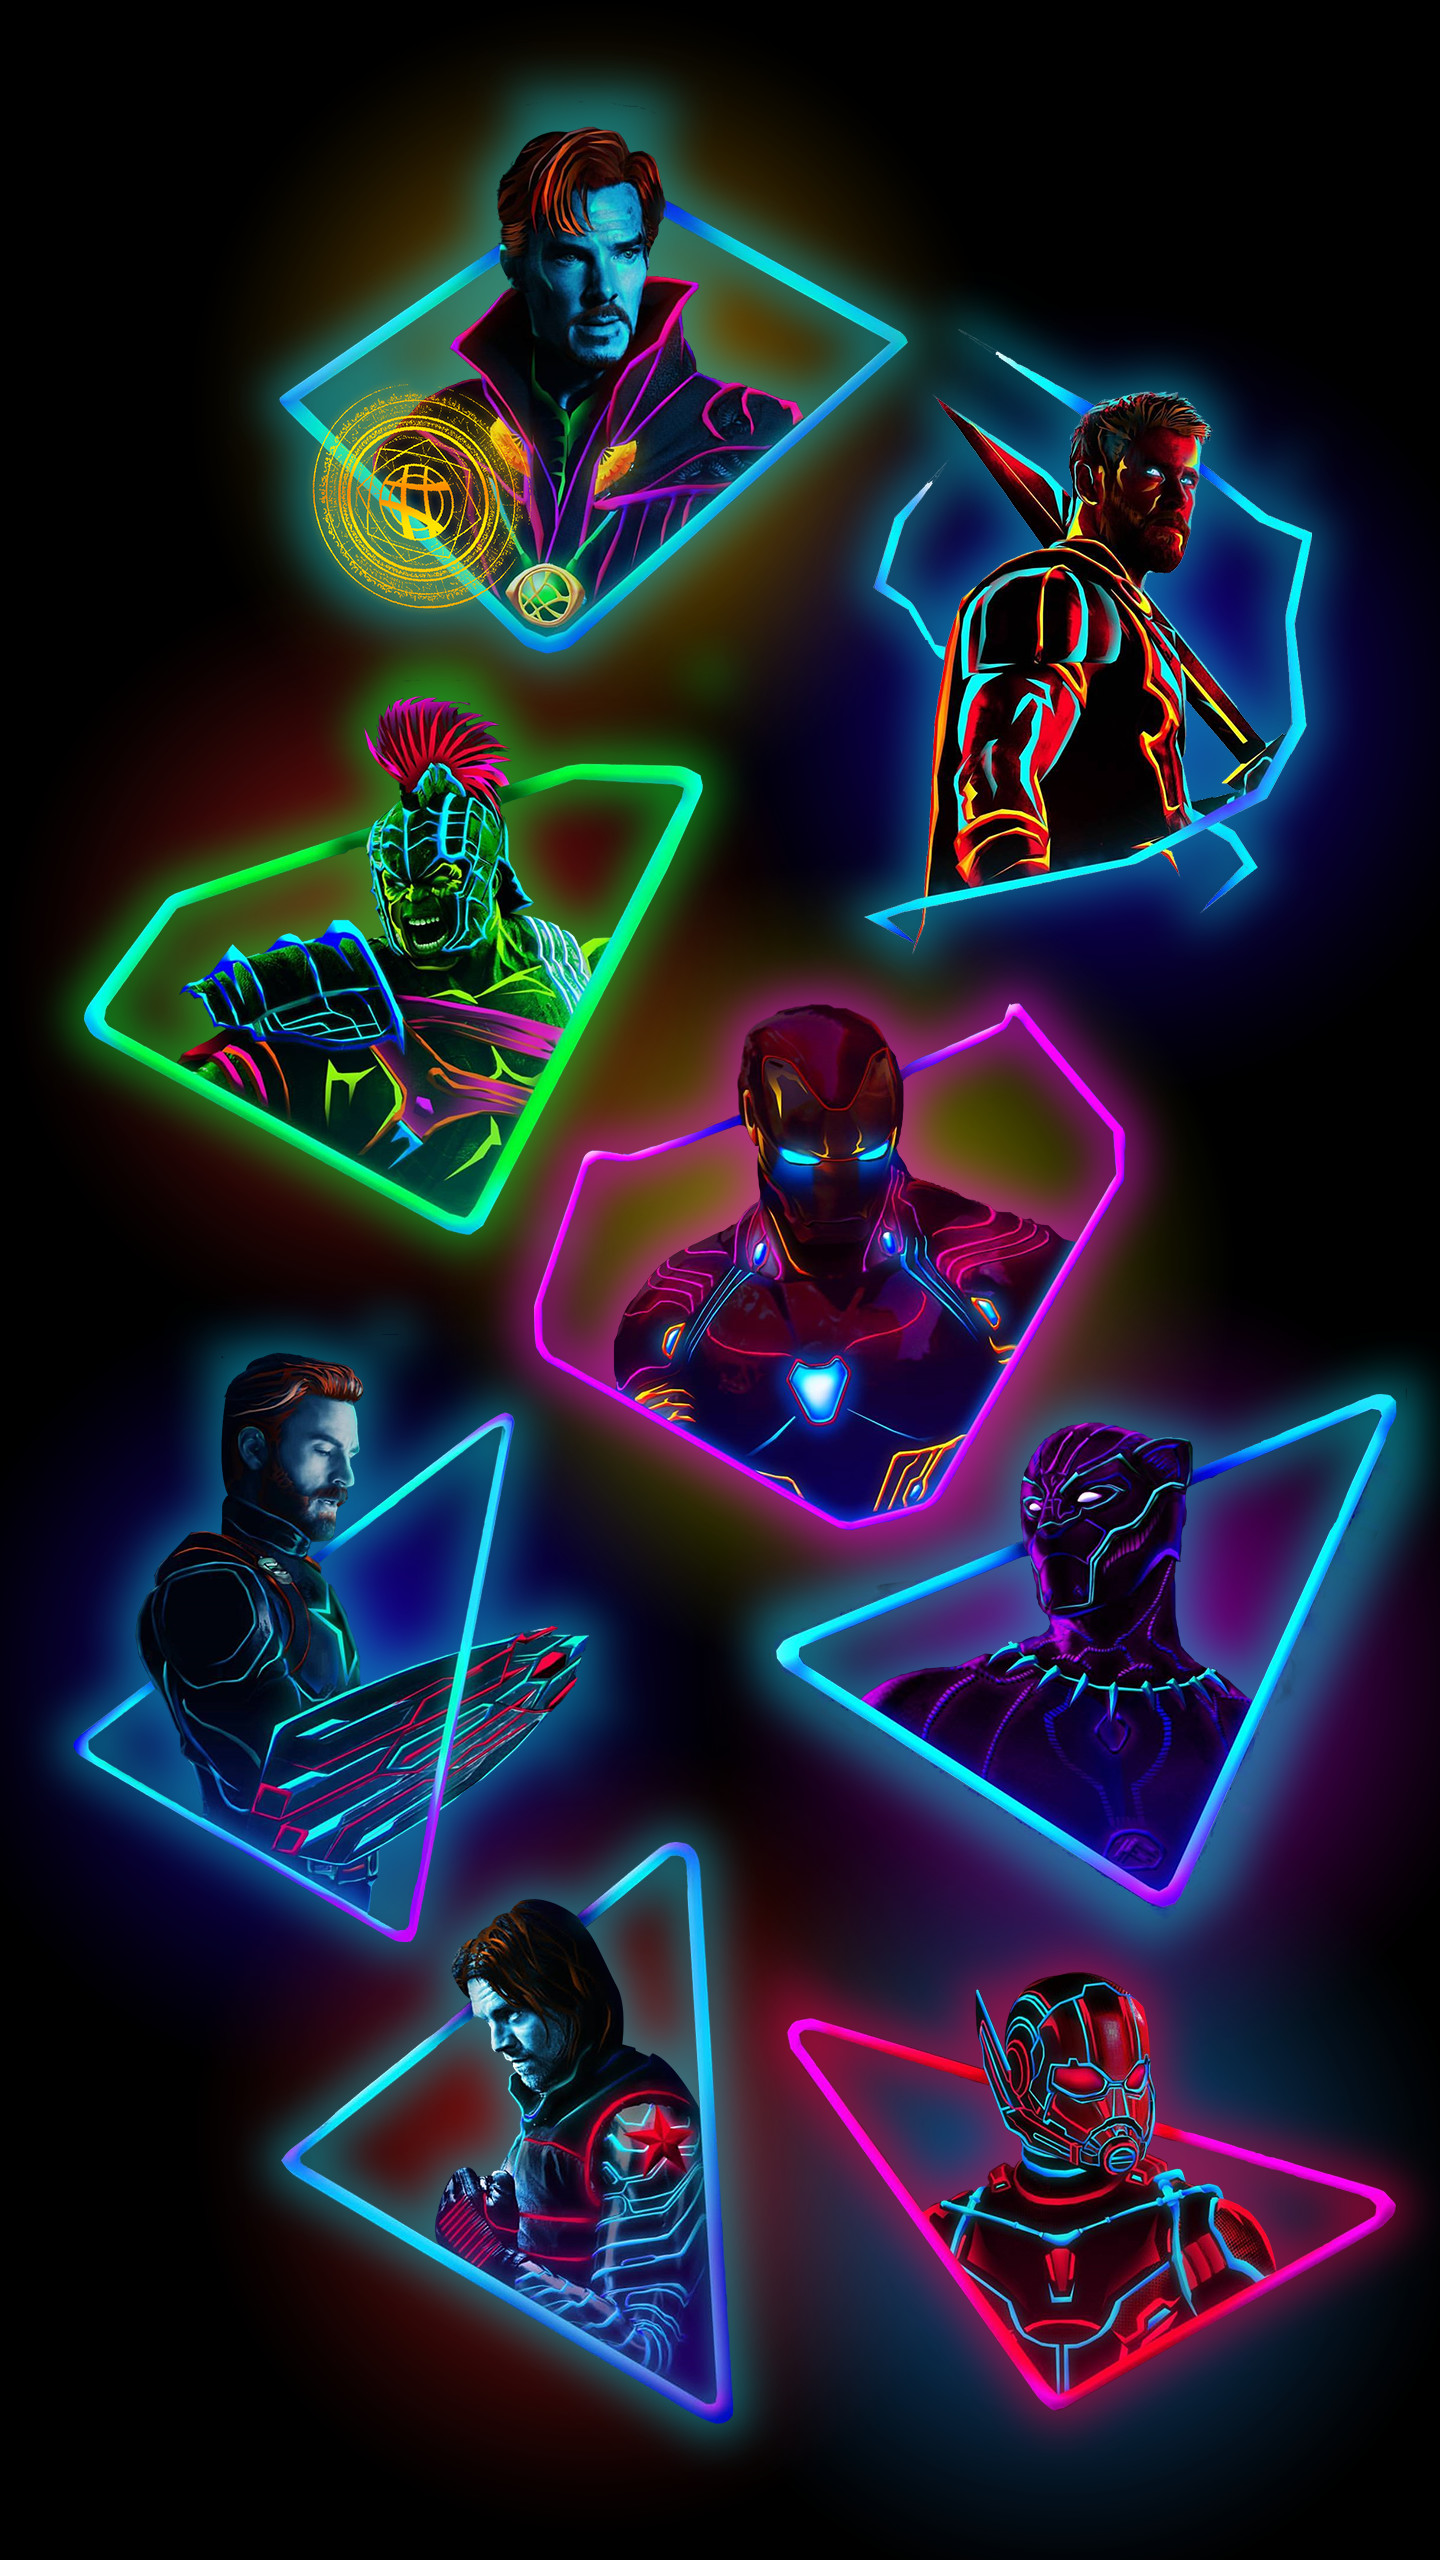 Black Neon Wallpaper (72+ images)